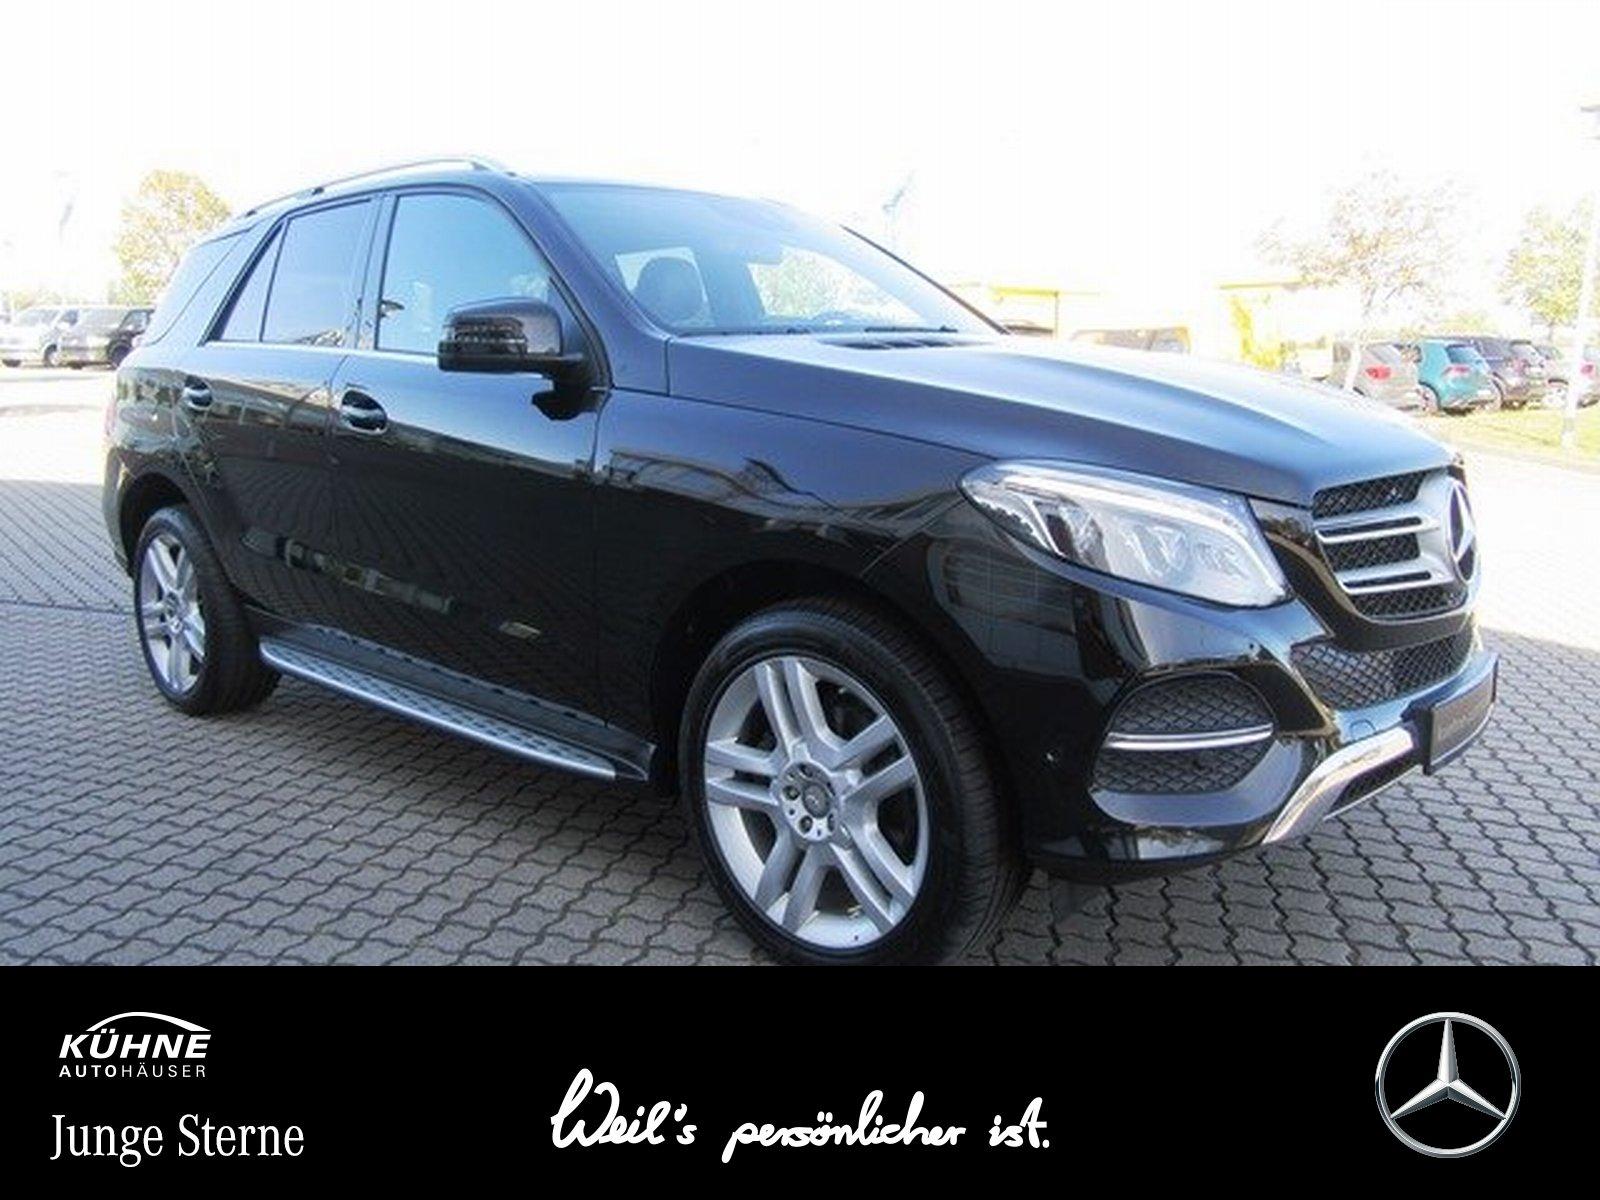 Mercedes-Benz GLE 350 d 4M+COMAND+20Zoll*LED+Easy+Trittbretter, Jahr 2015, Diesel